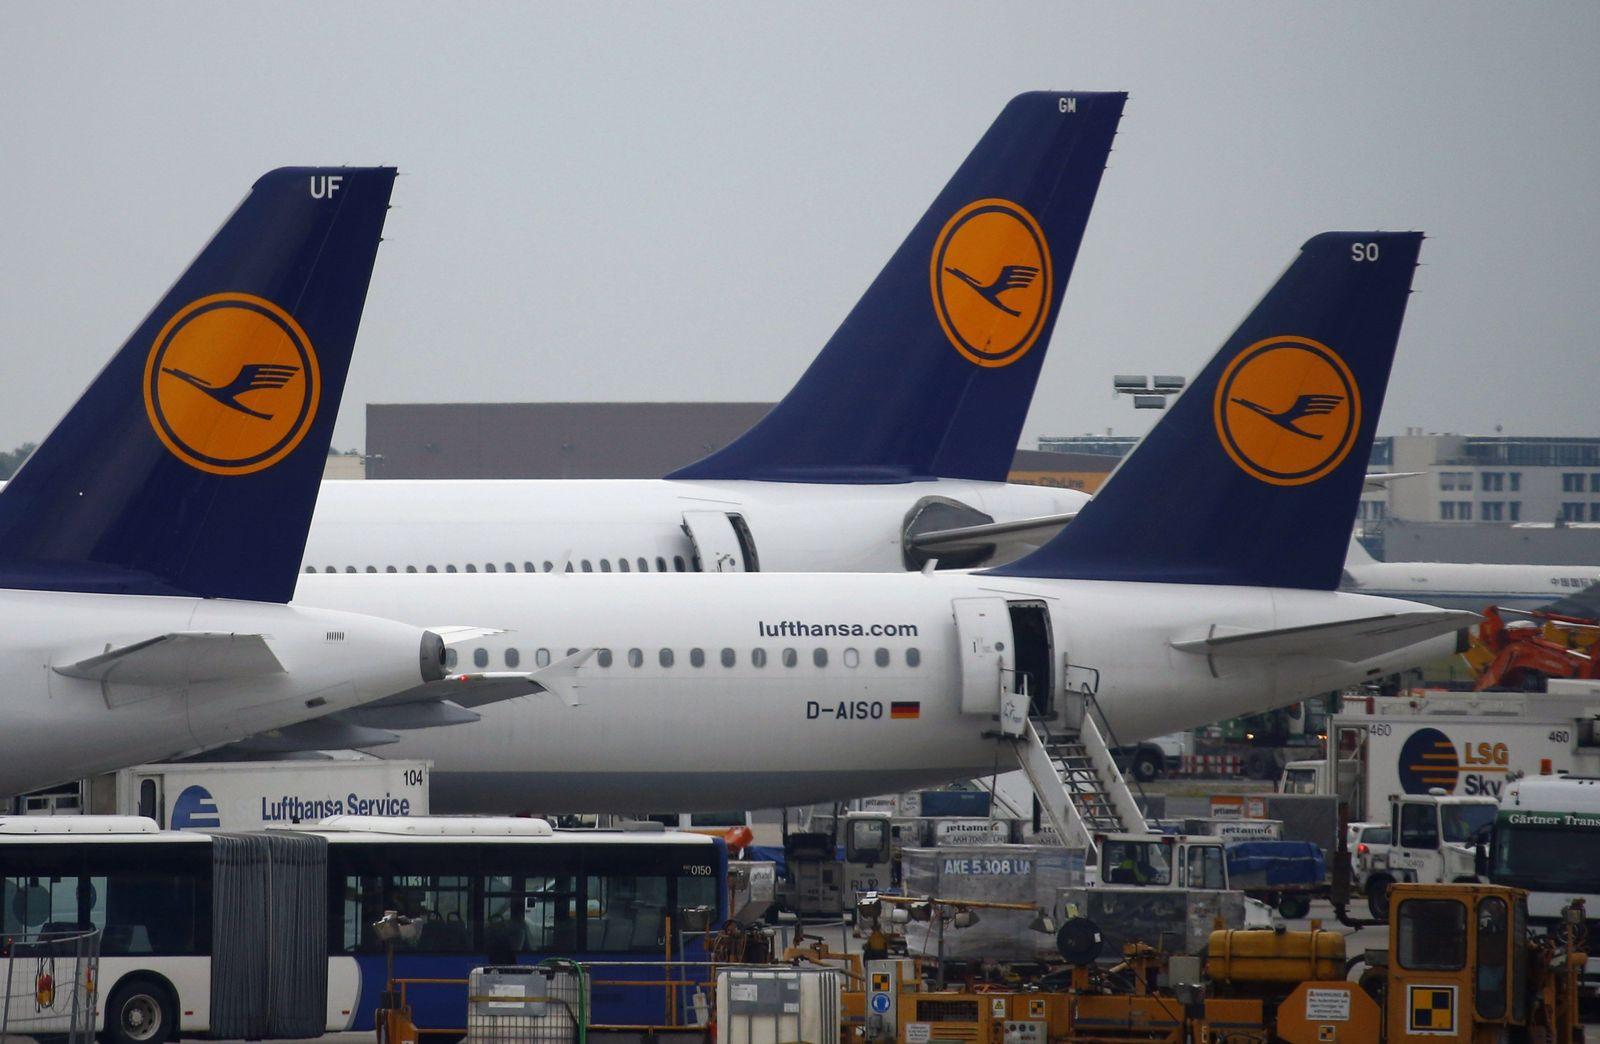 GERMANY-AIRPORT/STRIKE Lufthansa